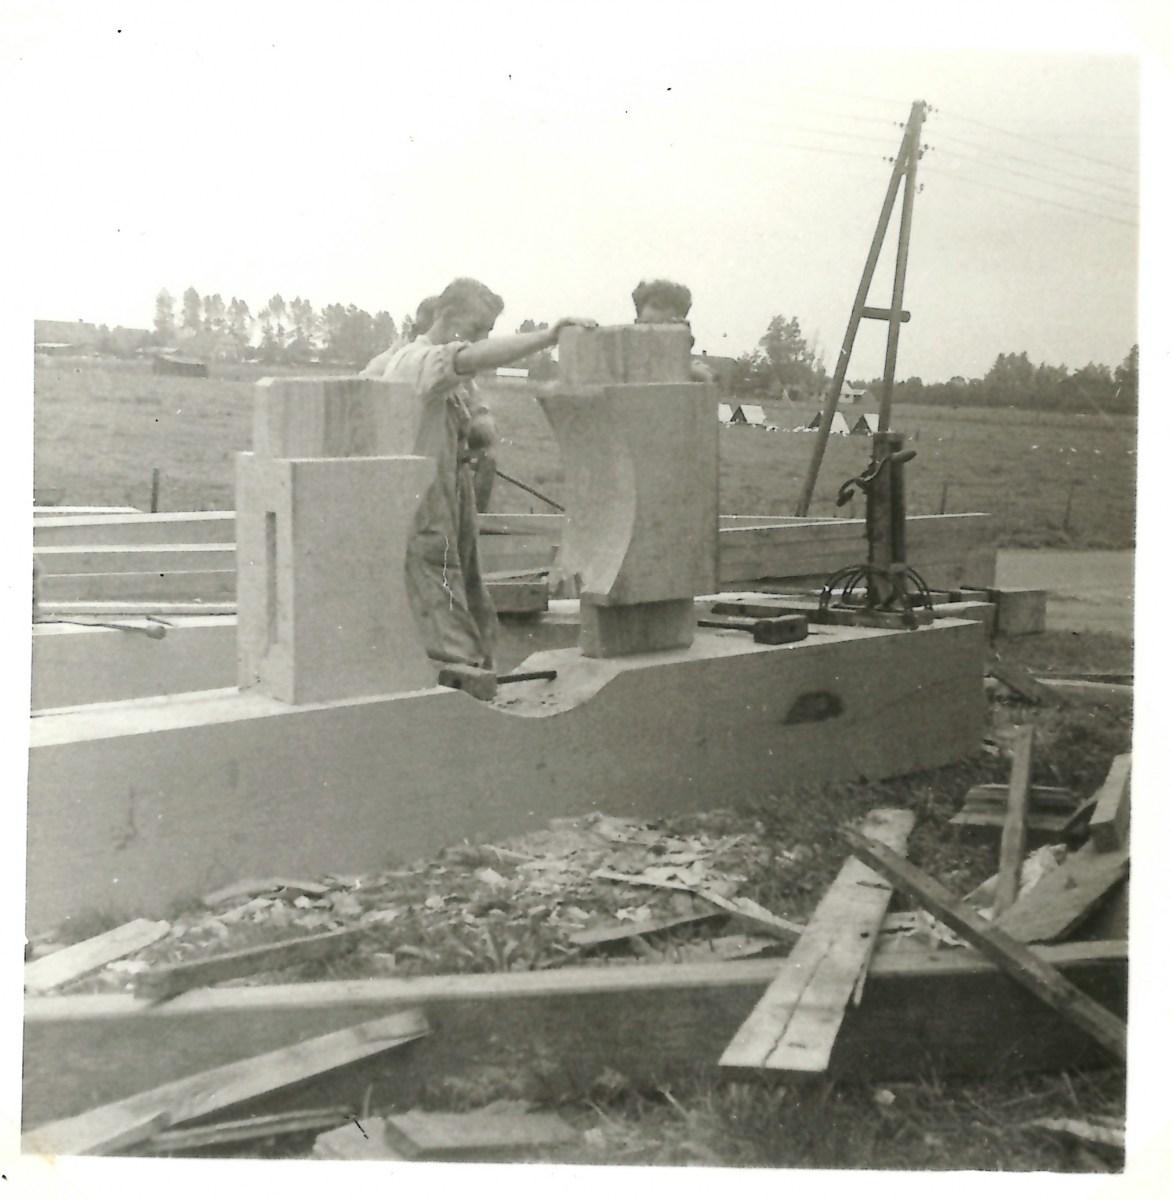 05-08-1964